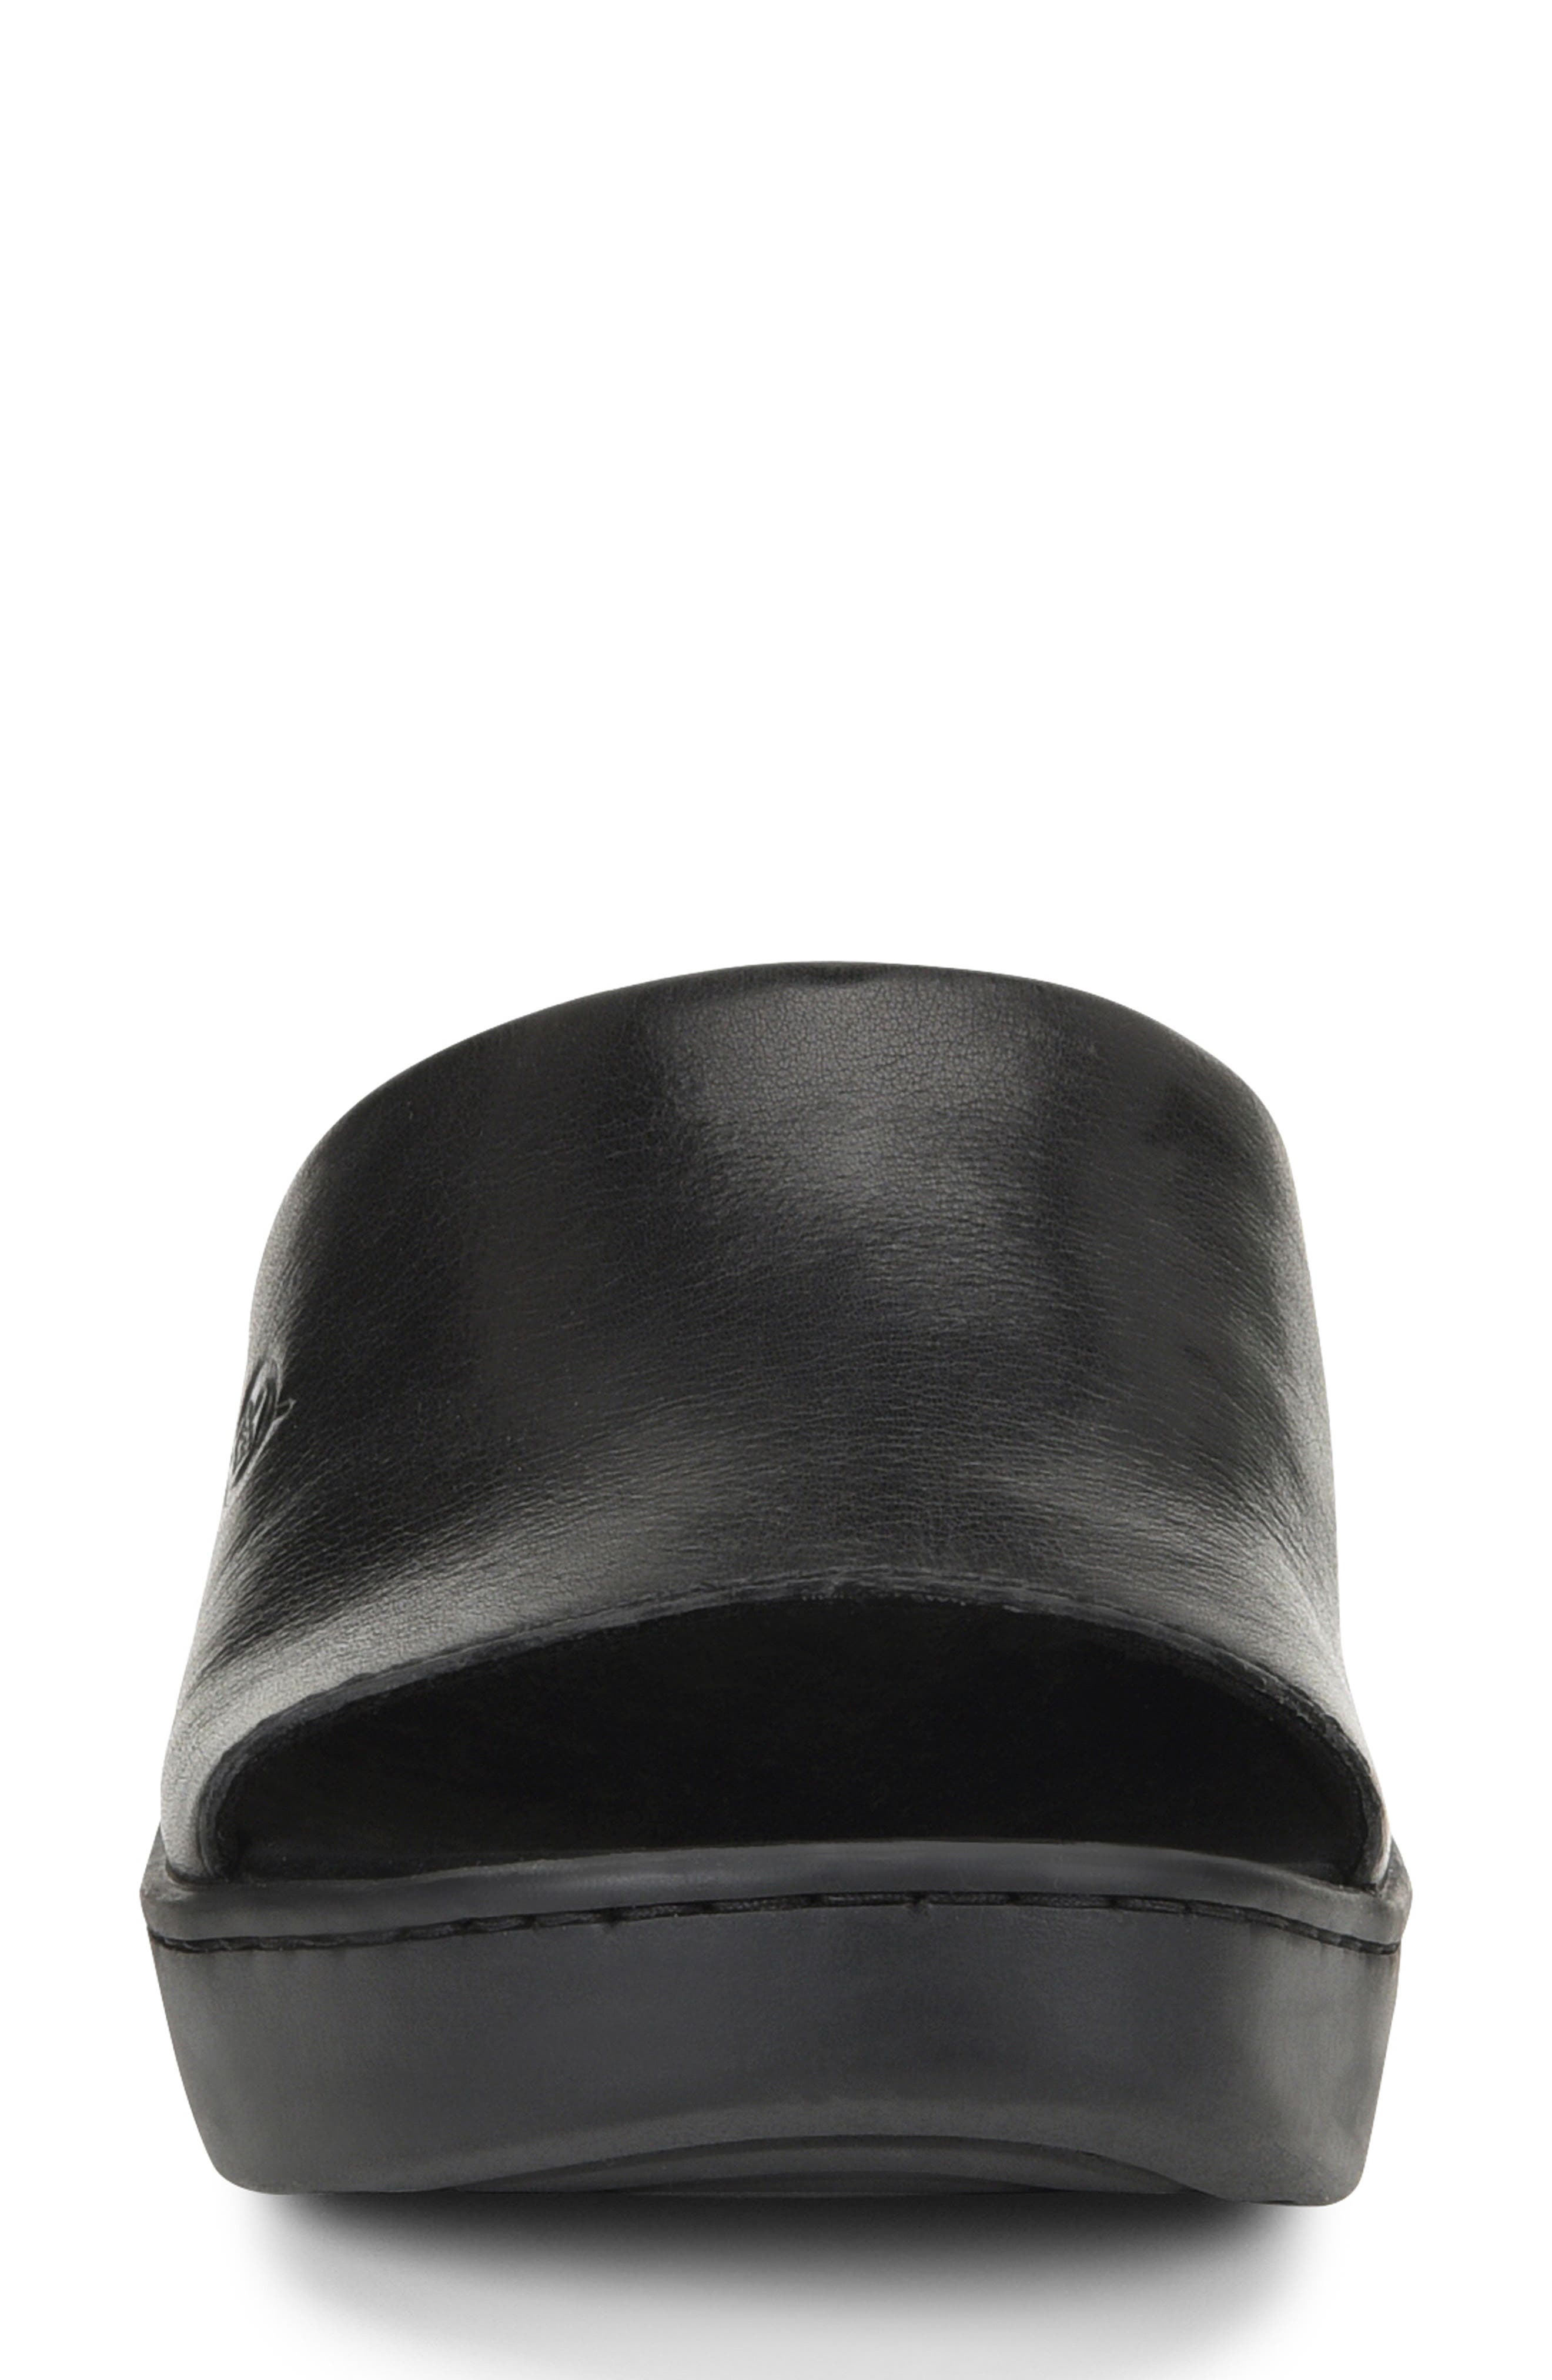 BØRN, Ottawa Slide Sandal, Alternate thumbnail 4, color, BLACK LEATHER